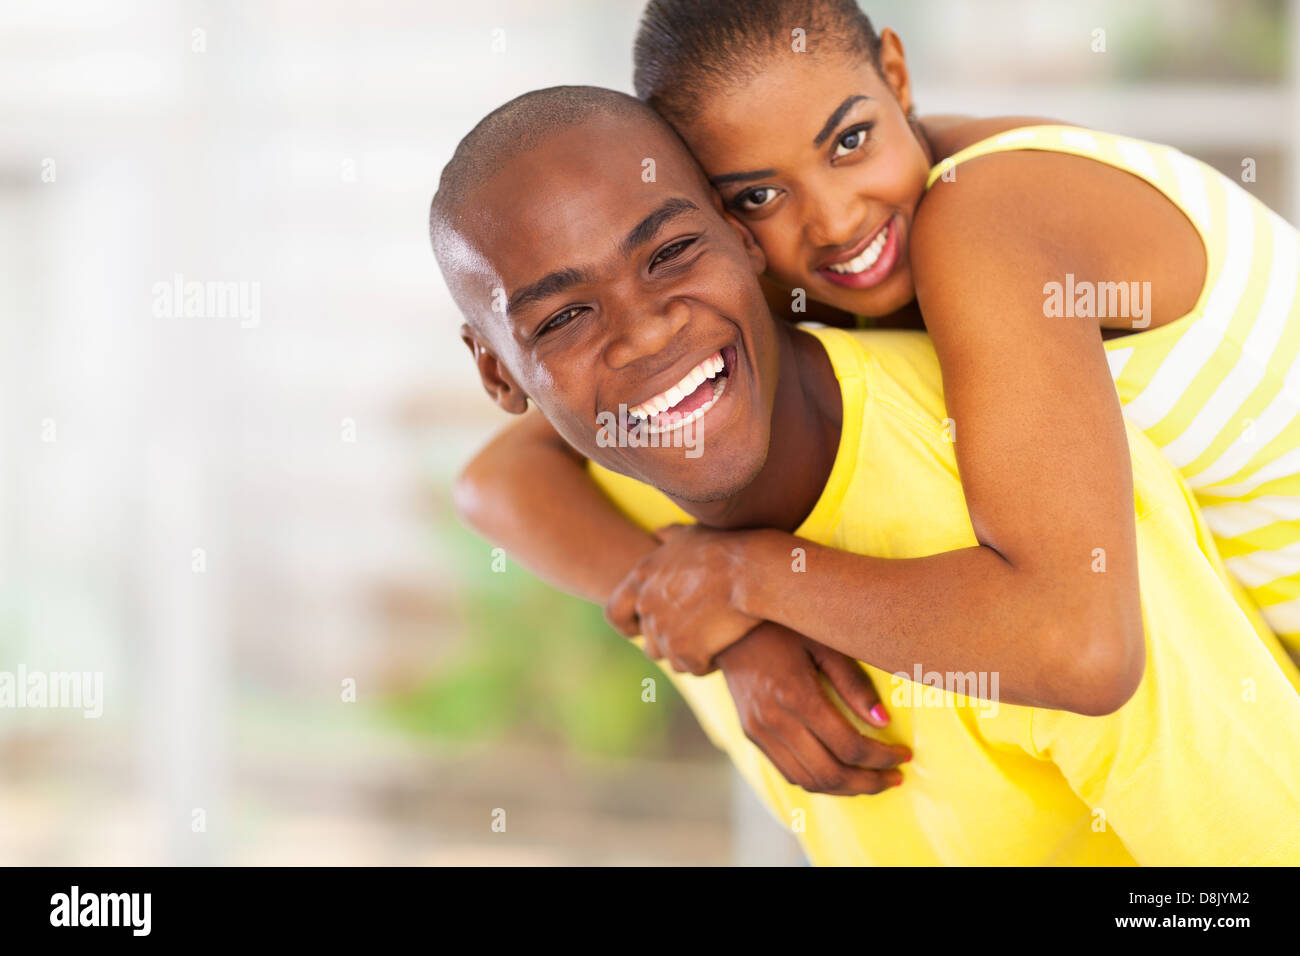 Retrato de dos jóvenes africanos juguetona piggyback Imagen De Stock